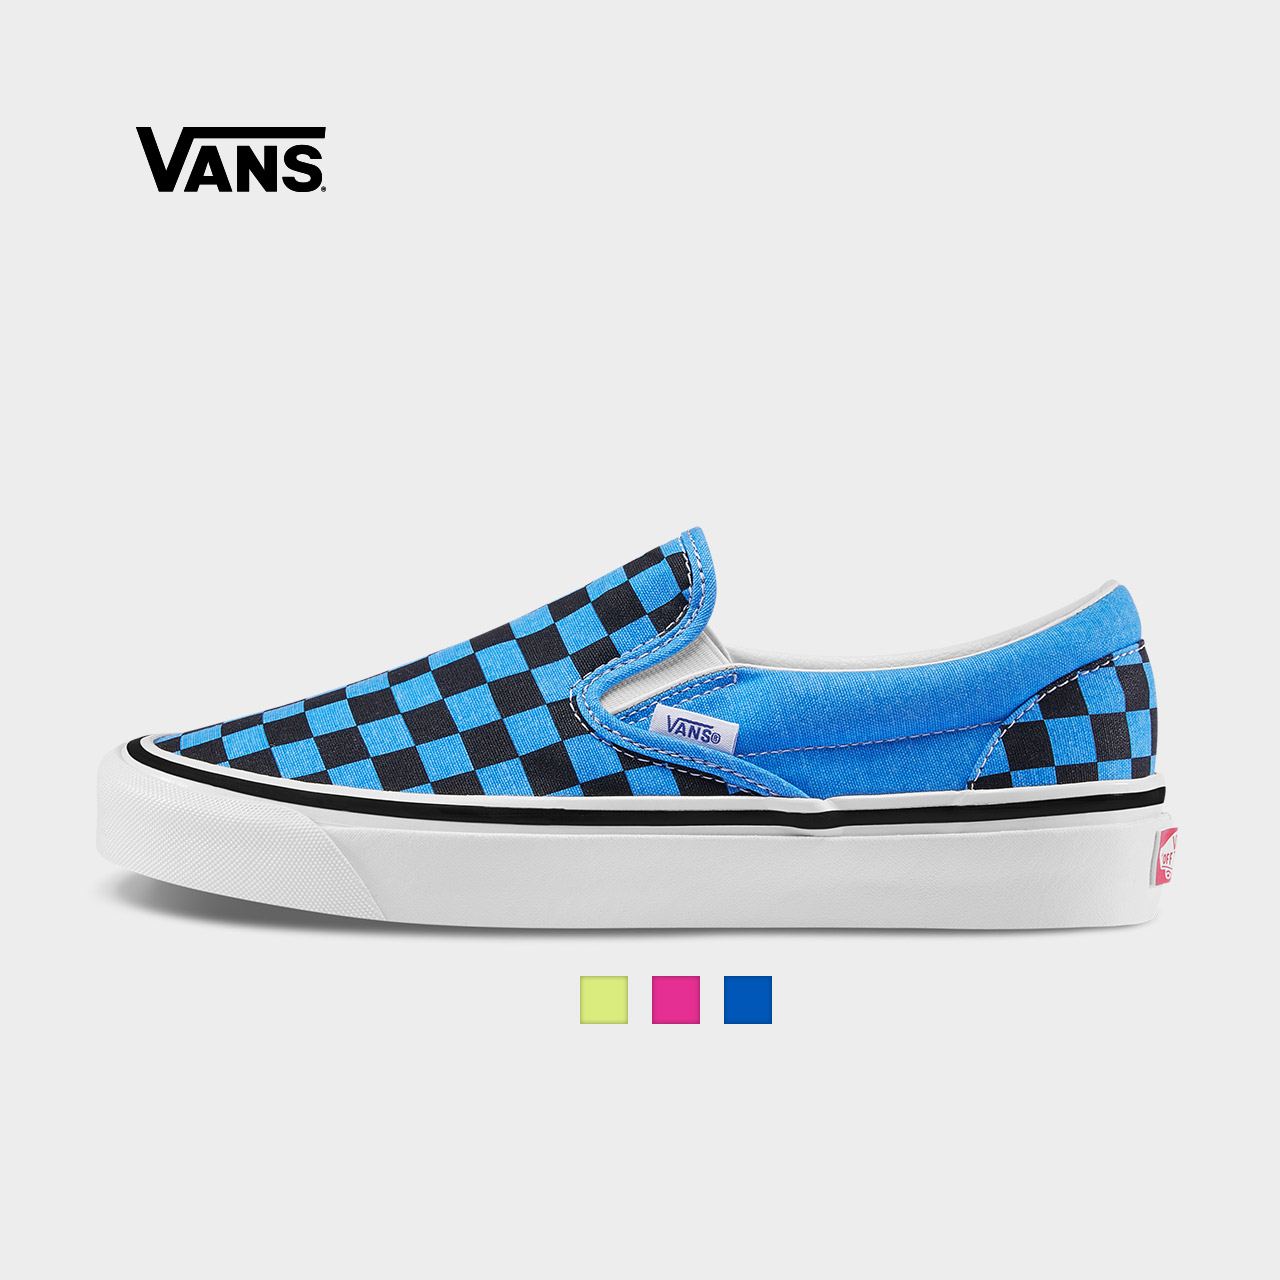 Vans范斯 经典系列 Slip-On帆布鞋 安纳海姆低帮男女新款官方正品